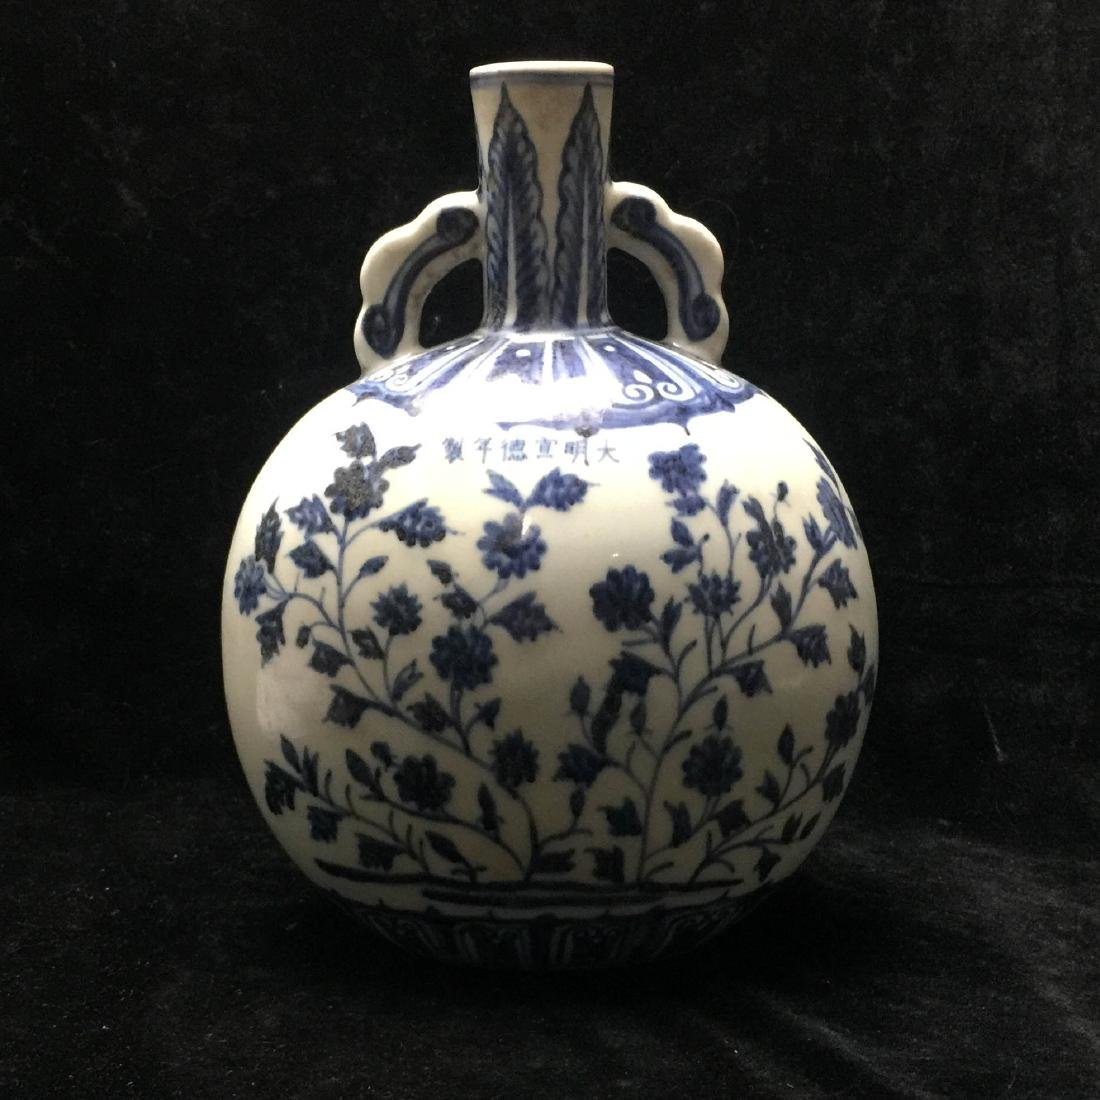 Floral Patterened BaoYua Vase